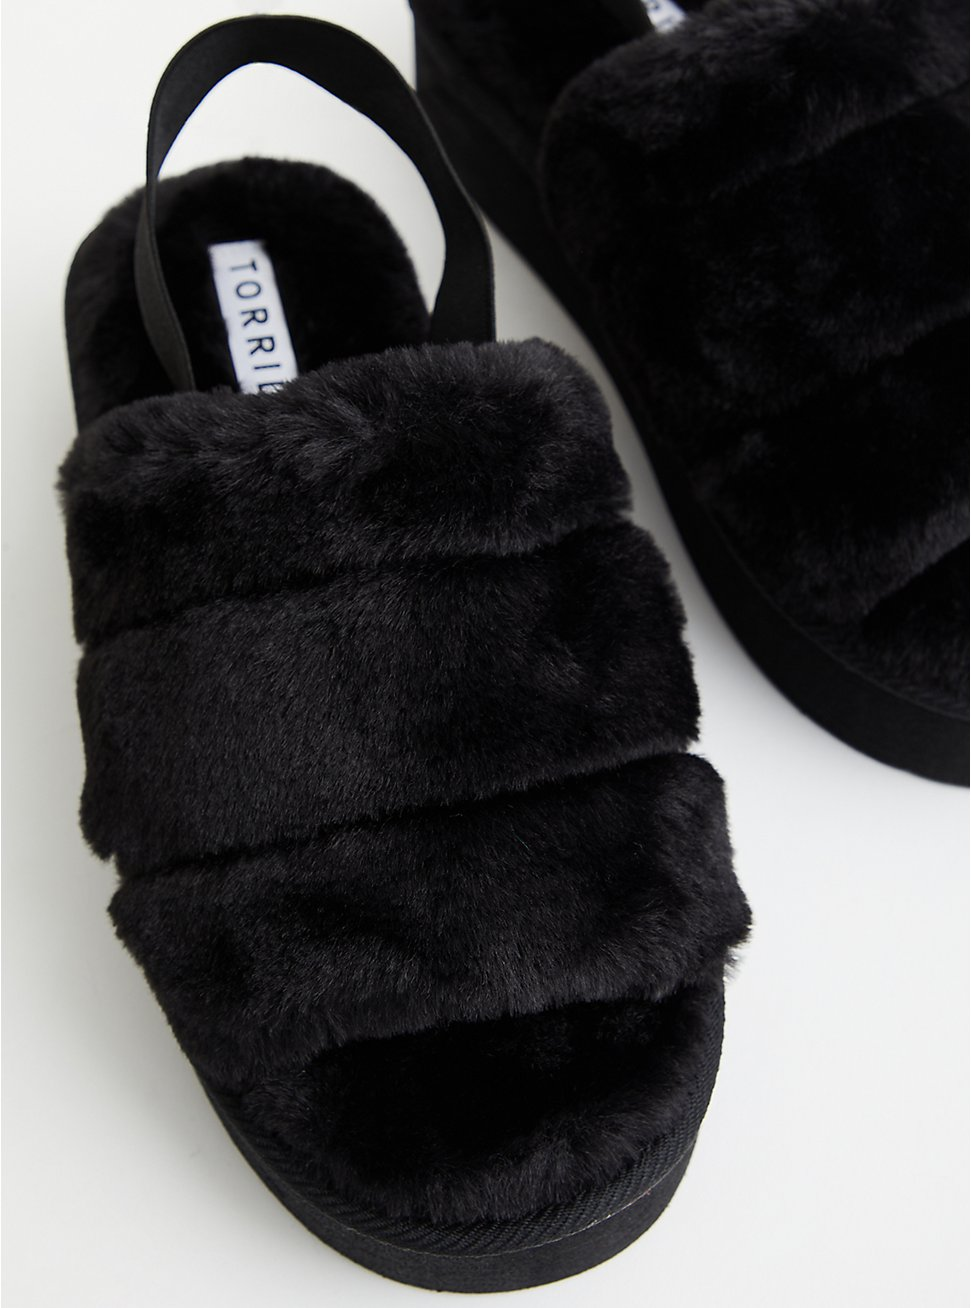 Platform Slipper - EVA & Faux Fur Black, BLACK, hi-res